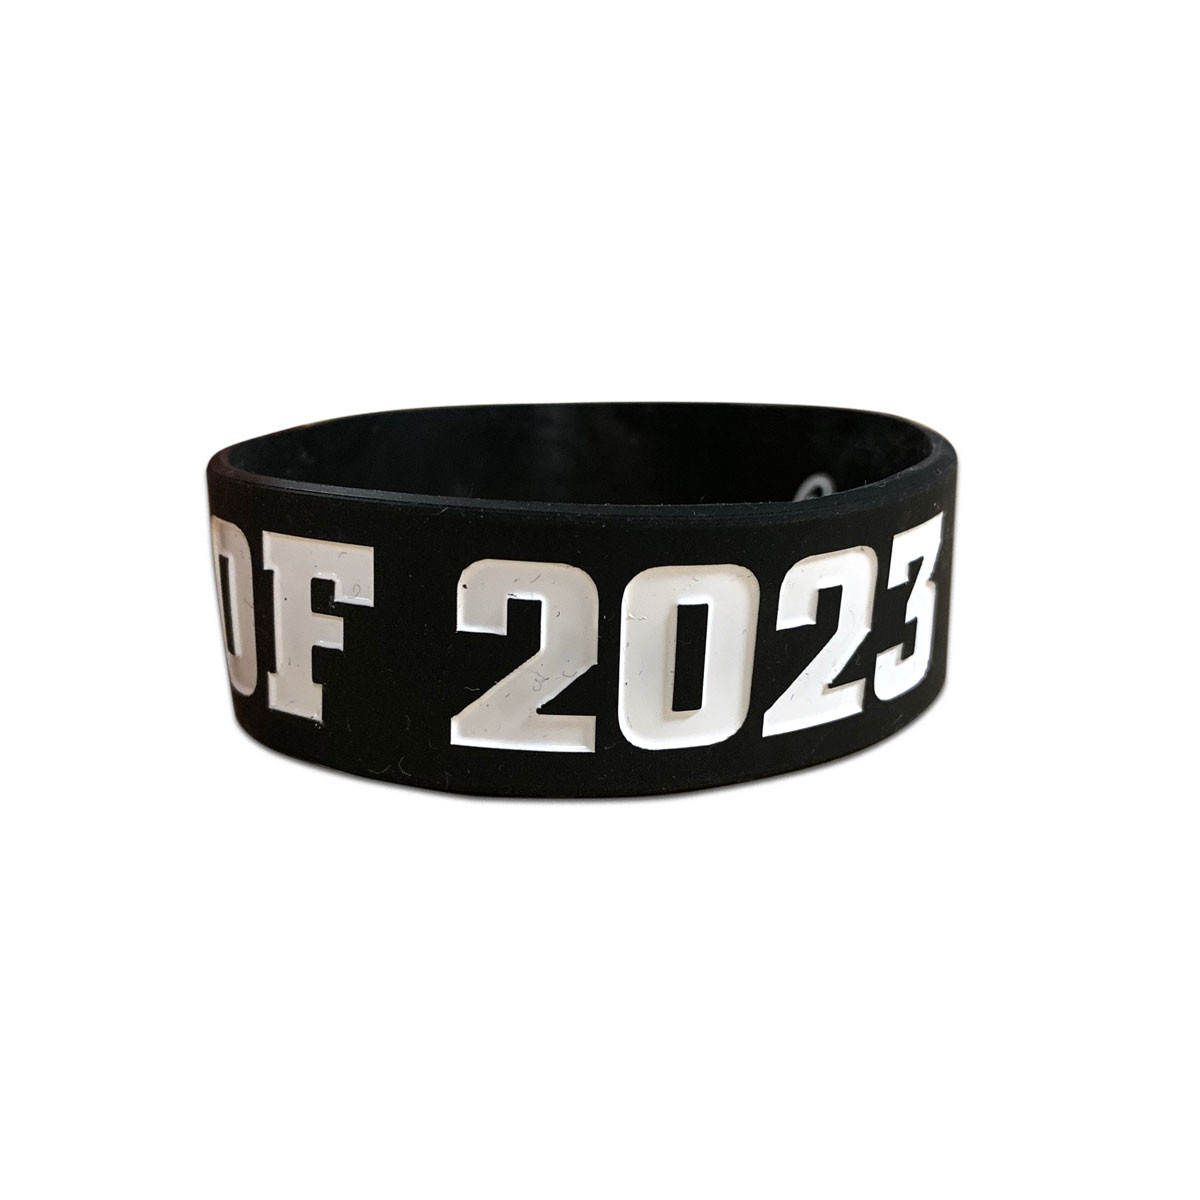 Class of 2023 Wristband